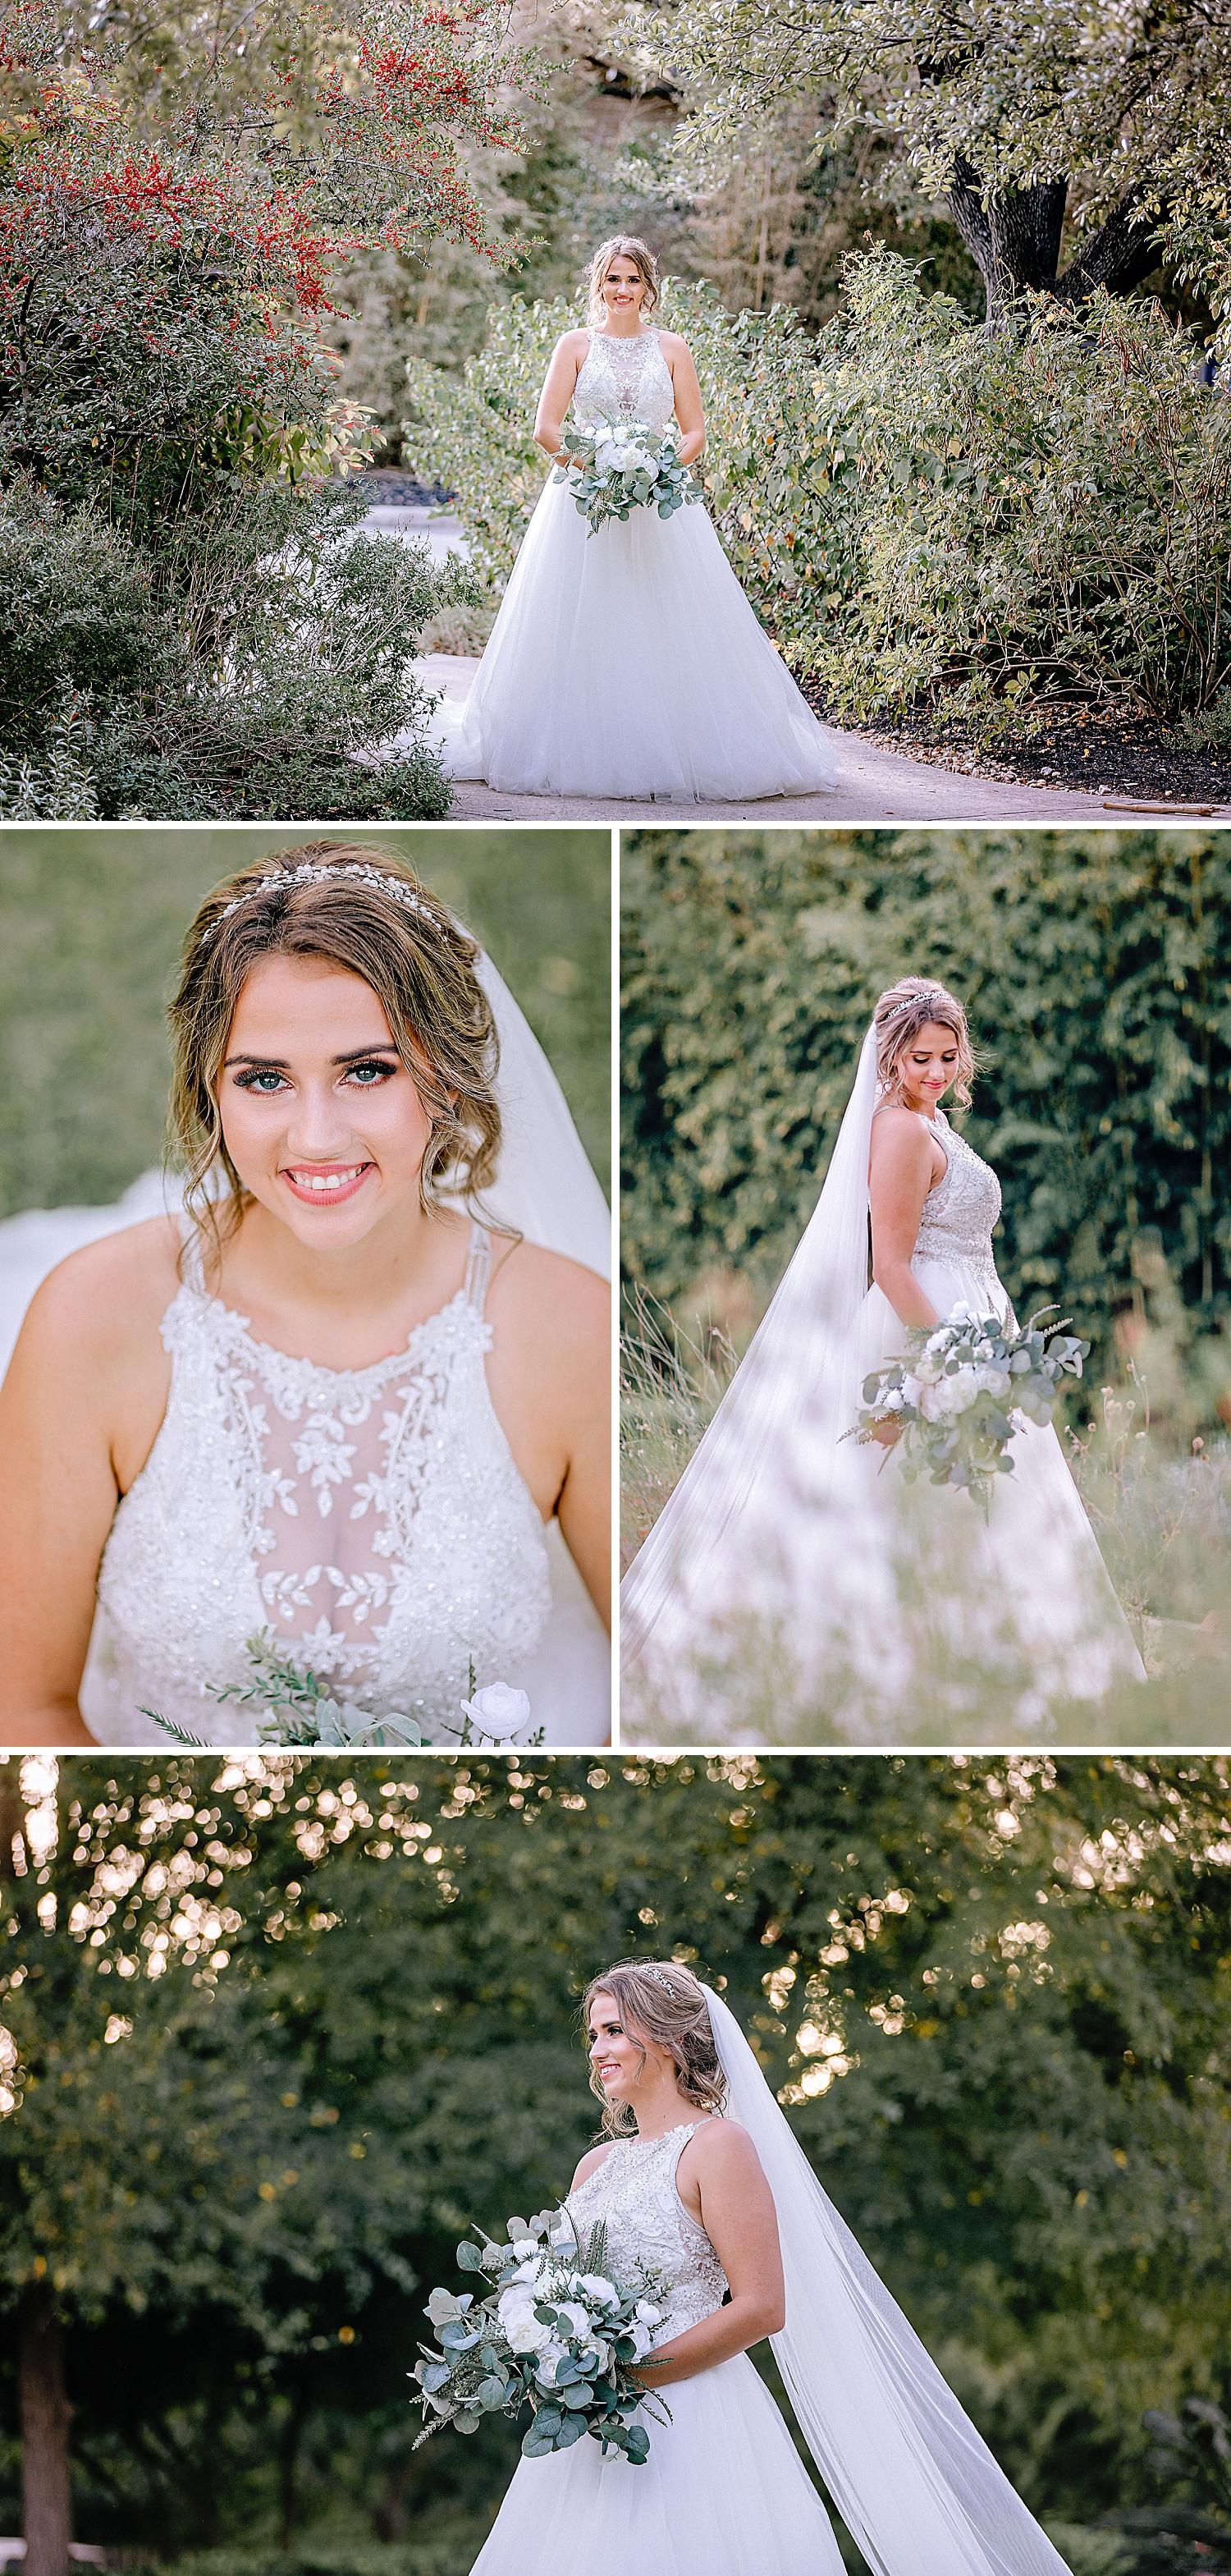 San-Antonio-Weddings-Bridal-Photos-Carly-Barton-Photography_0024.jpg